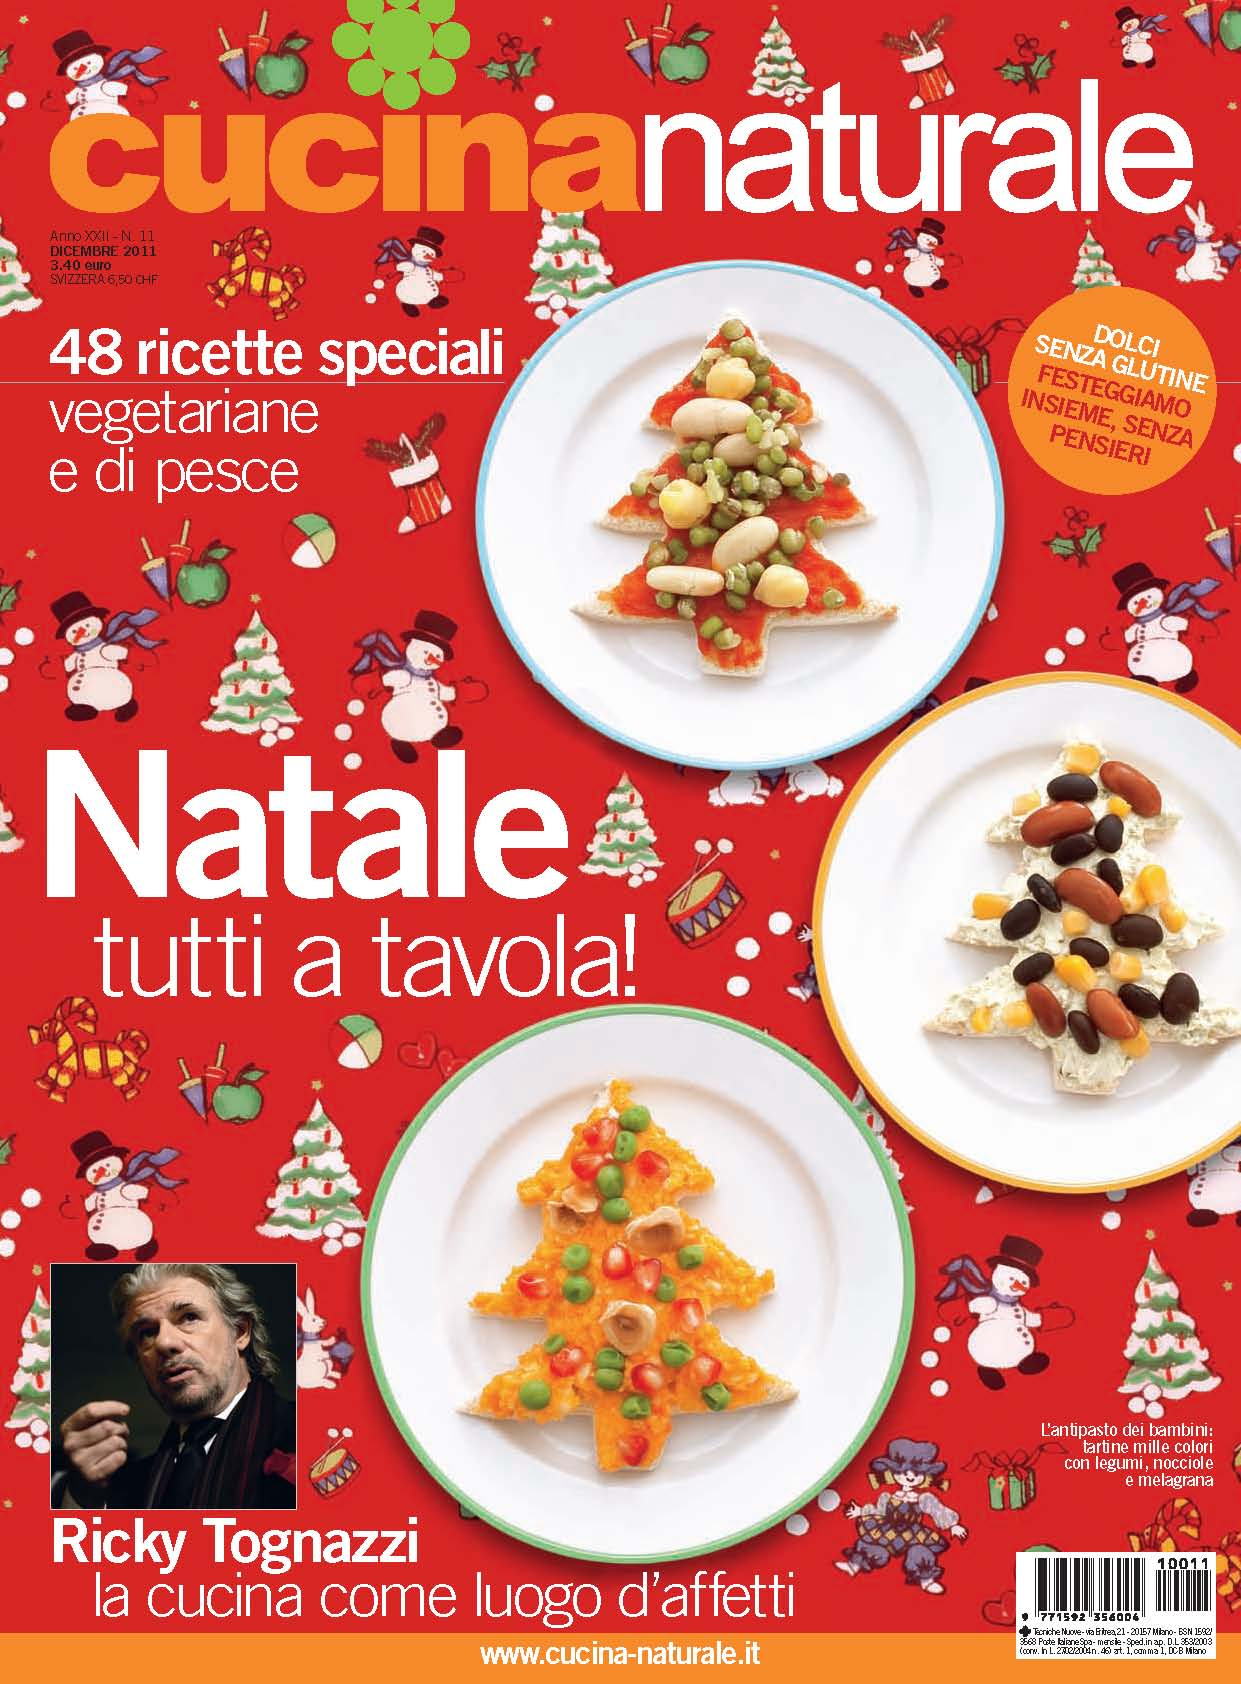 Cucina Naturale di dicembre: Natale tutti a tavola!